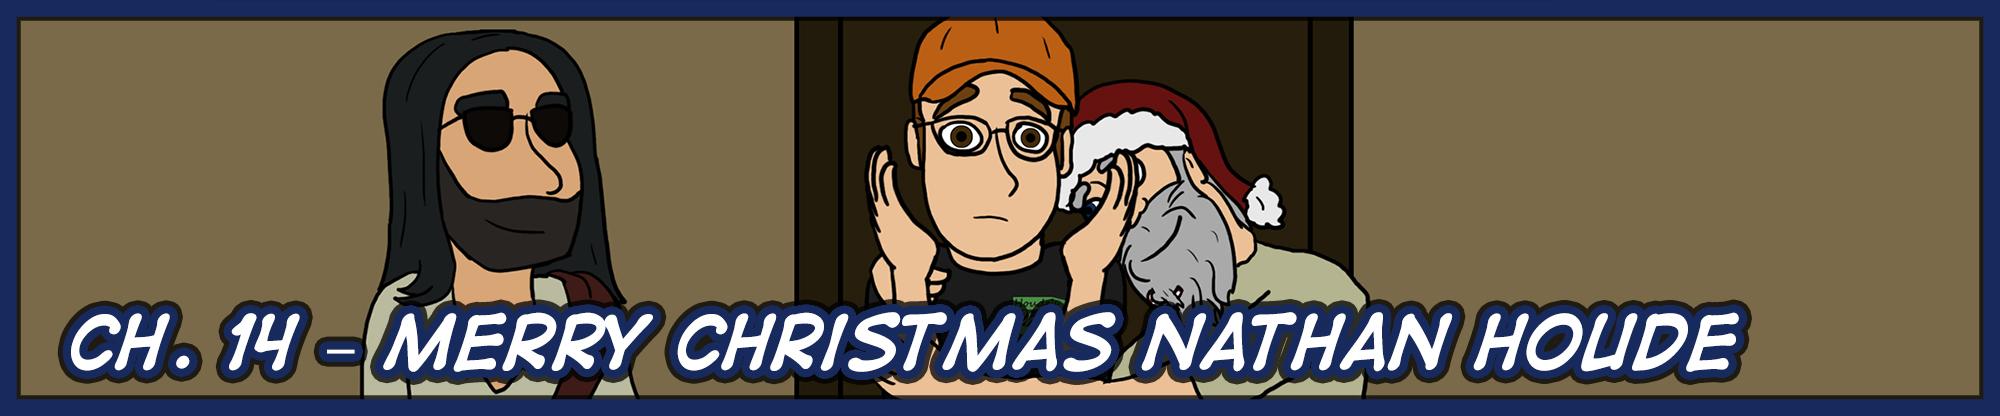 Ch. 14 – Merry Christmas Nathan Houde